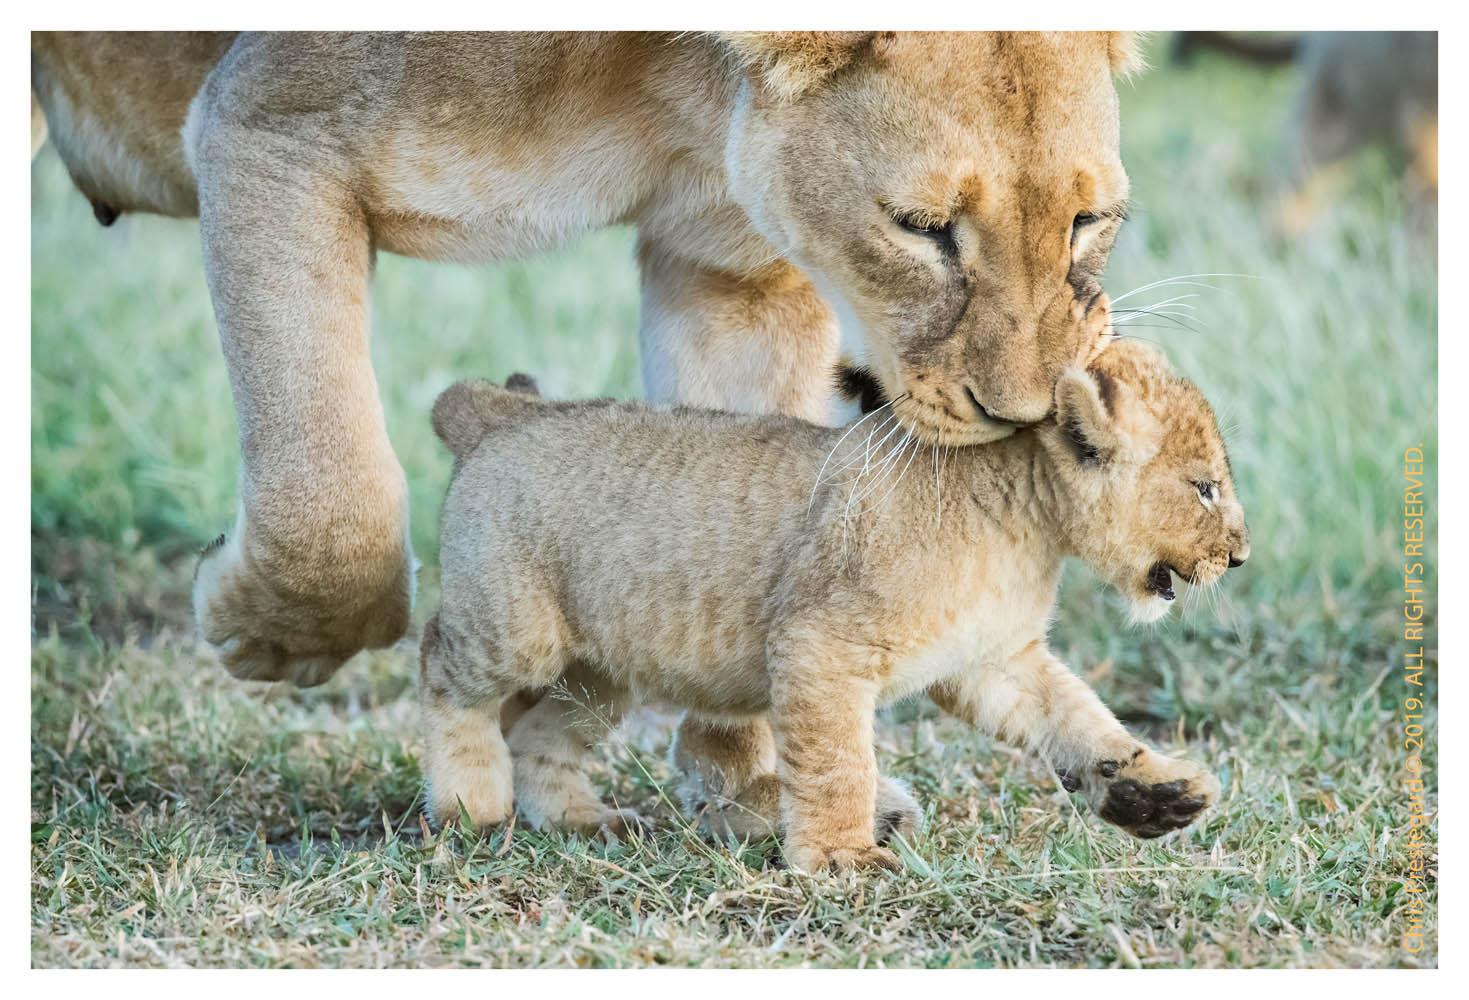 Lion cubs at Ndutu, Tanzania in Feb. 2019